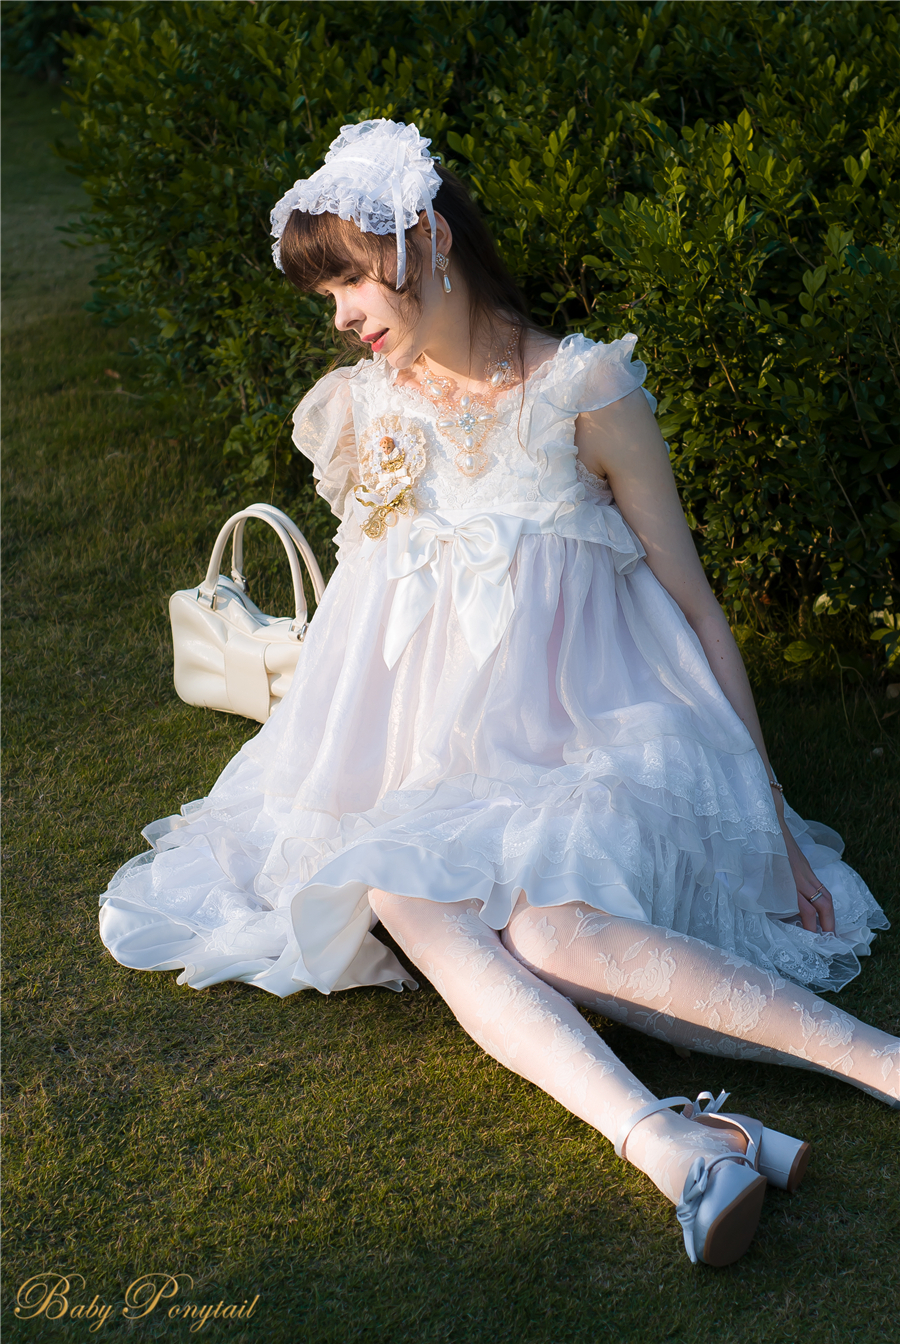 BabyPonytail_modelclaudia_Present Angel White JSK park07.jpg